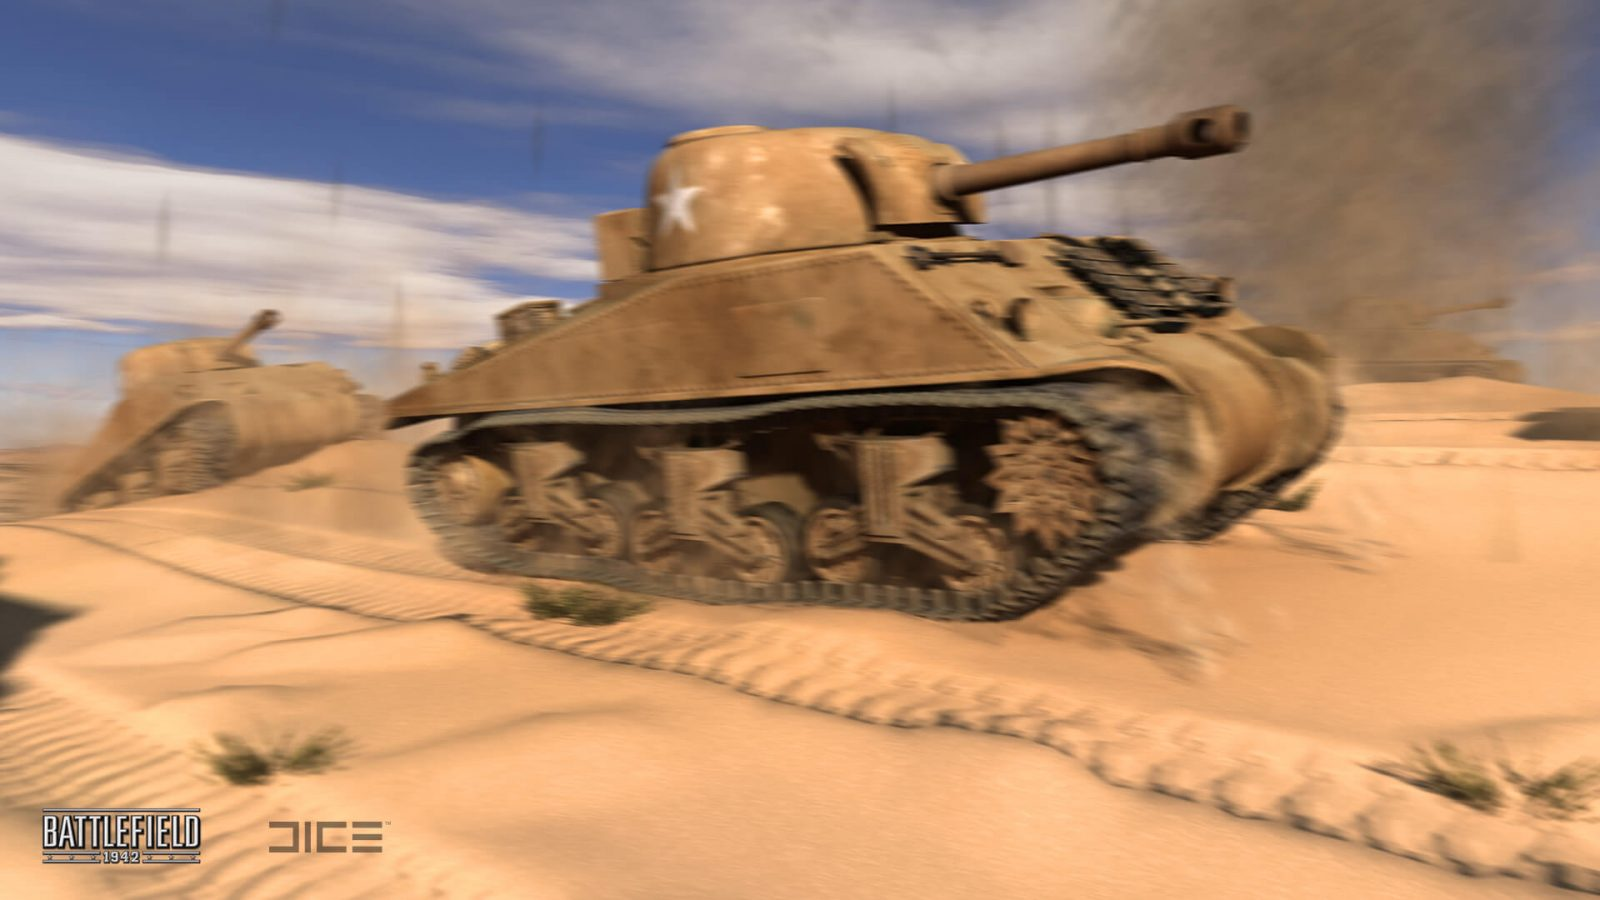 Motivational Wallpaper Cute Battlefield 1942 Tanks Hd Wallpaper